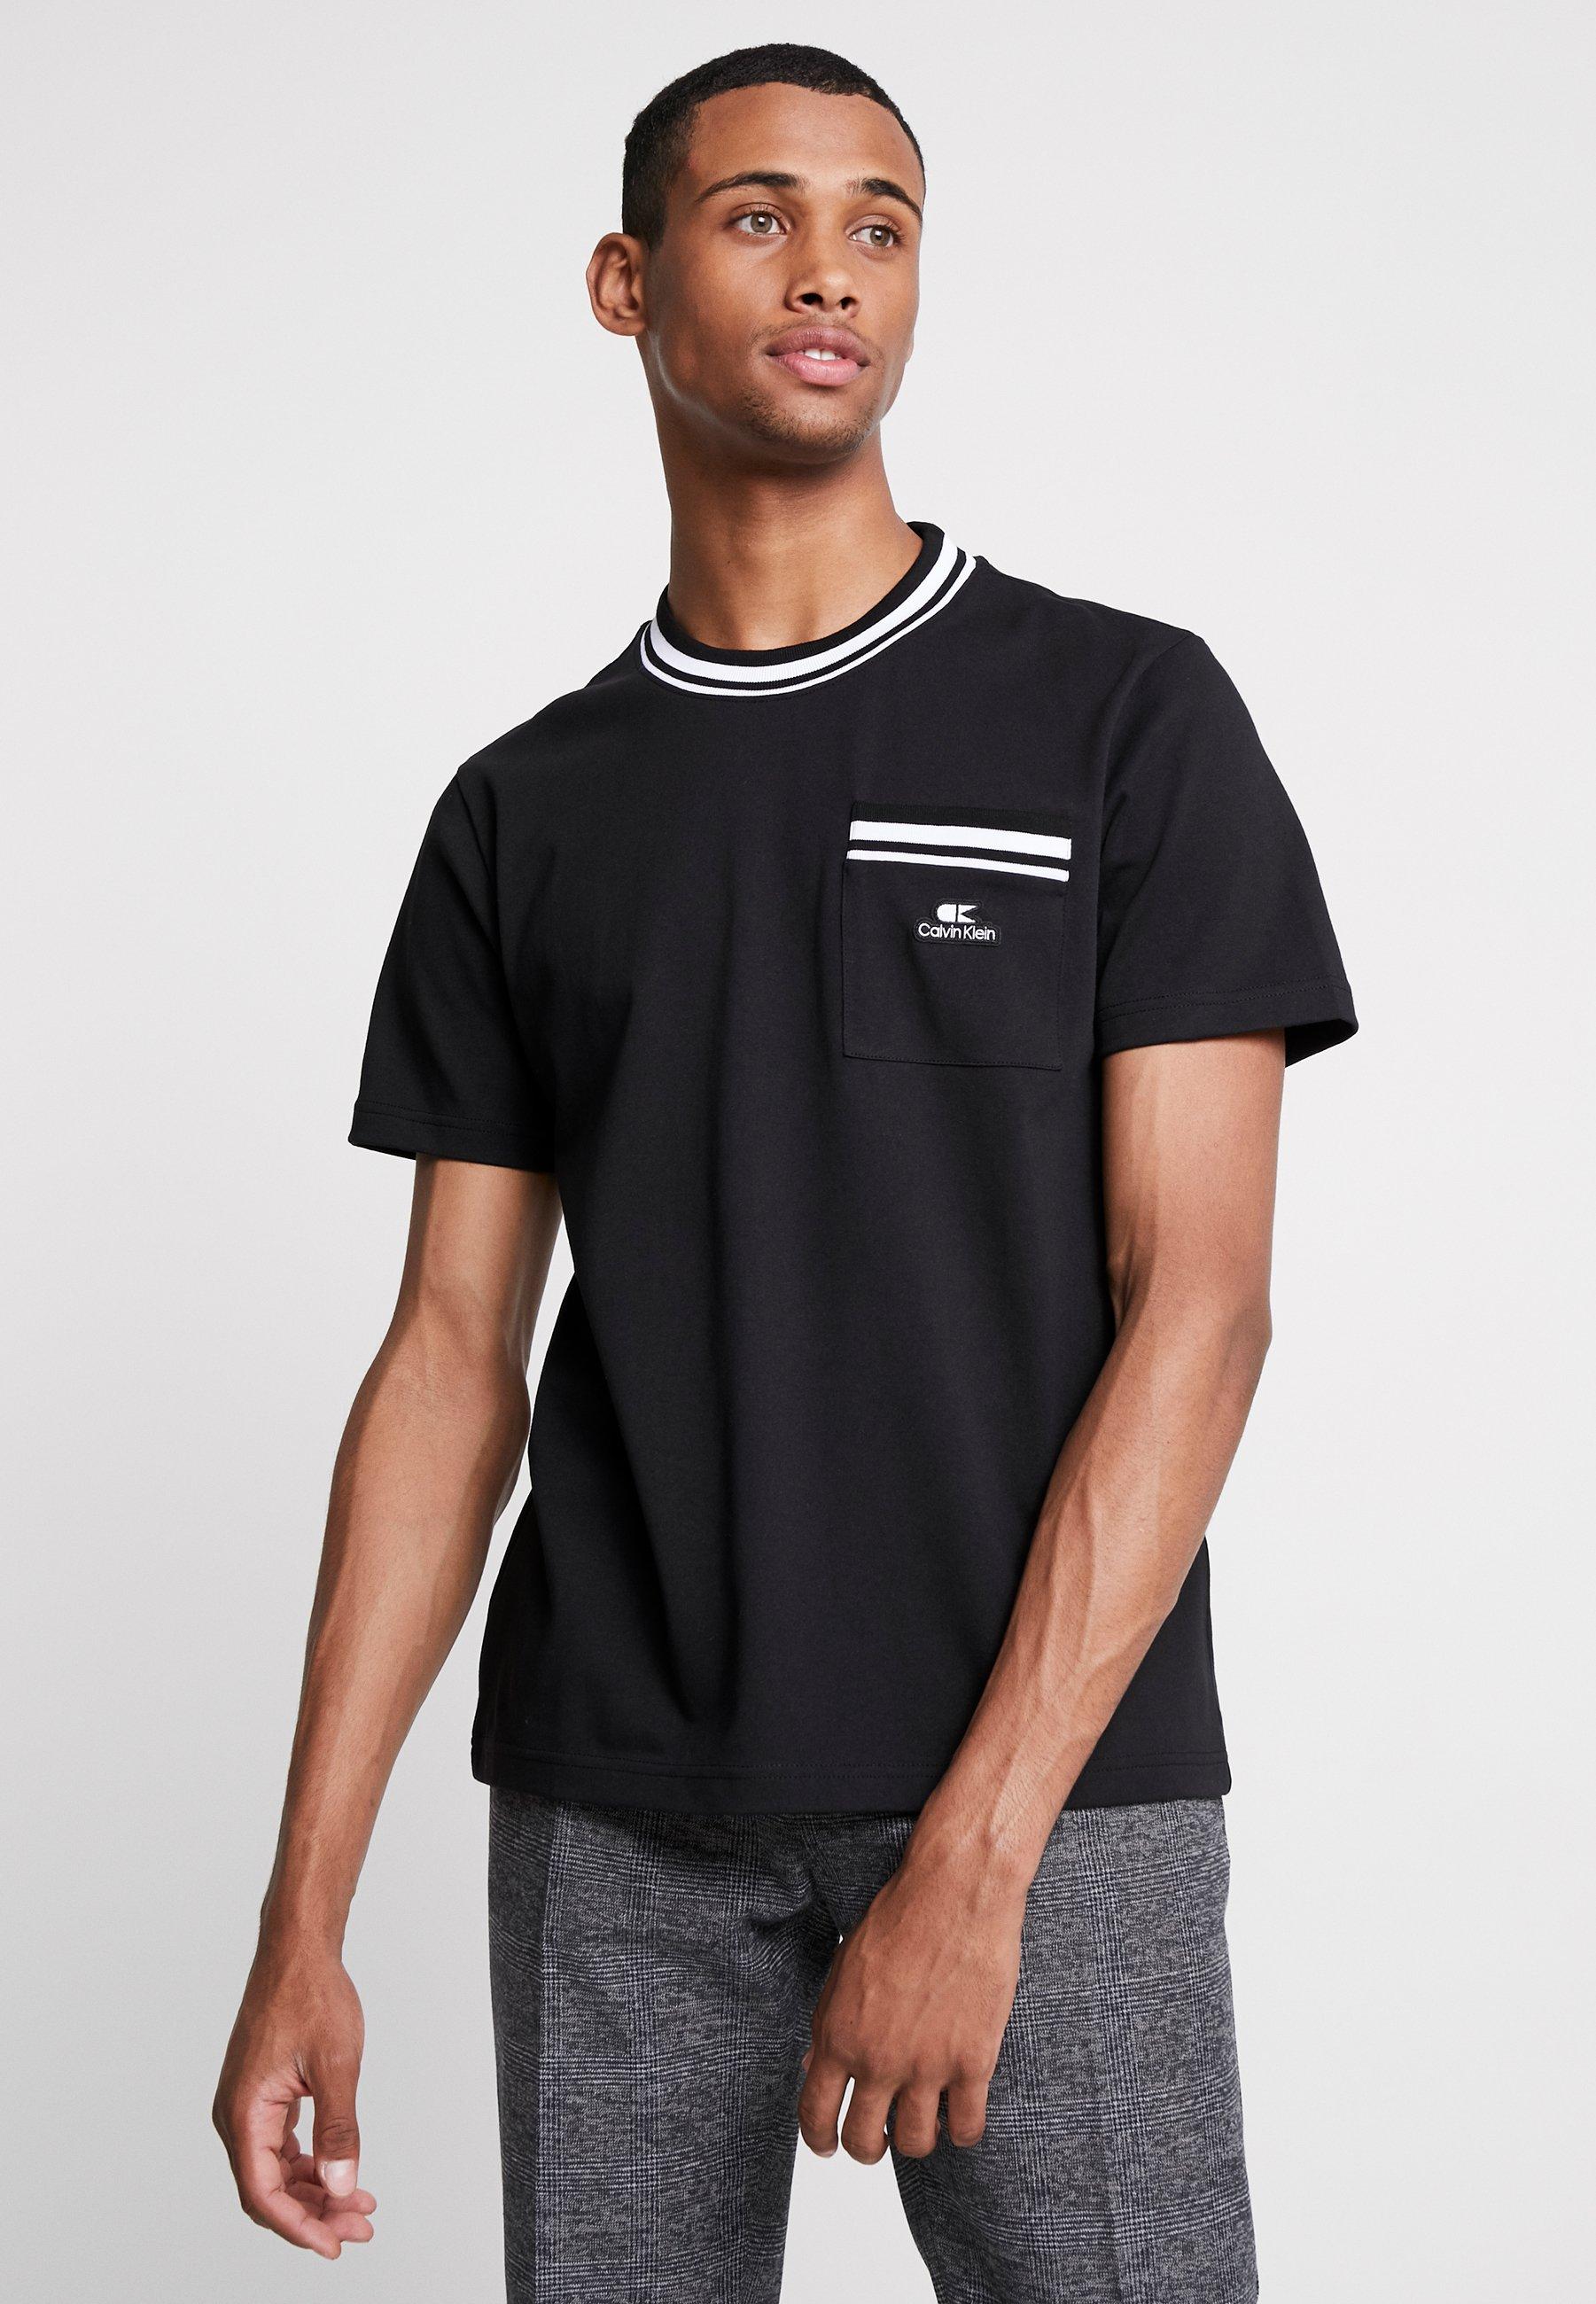 shirt Badge RingerT Klein Vintage Basique Calvin Black 2HDWE9IYe